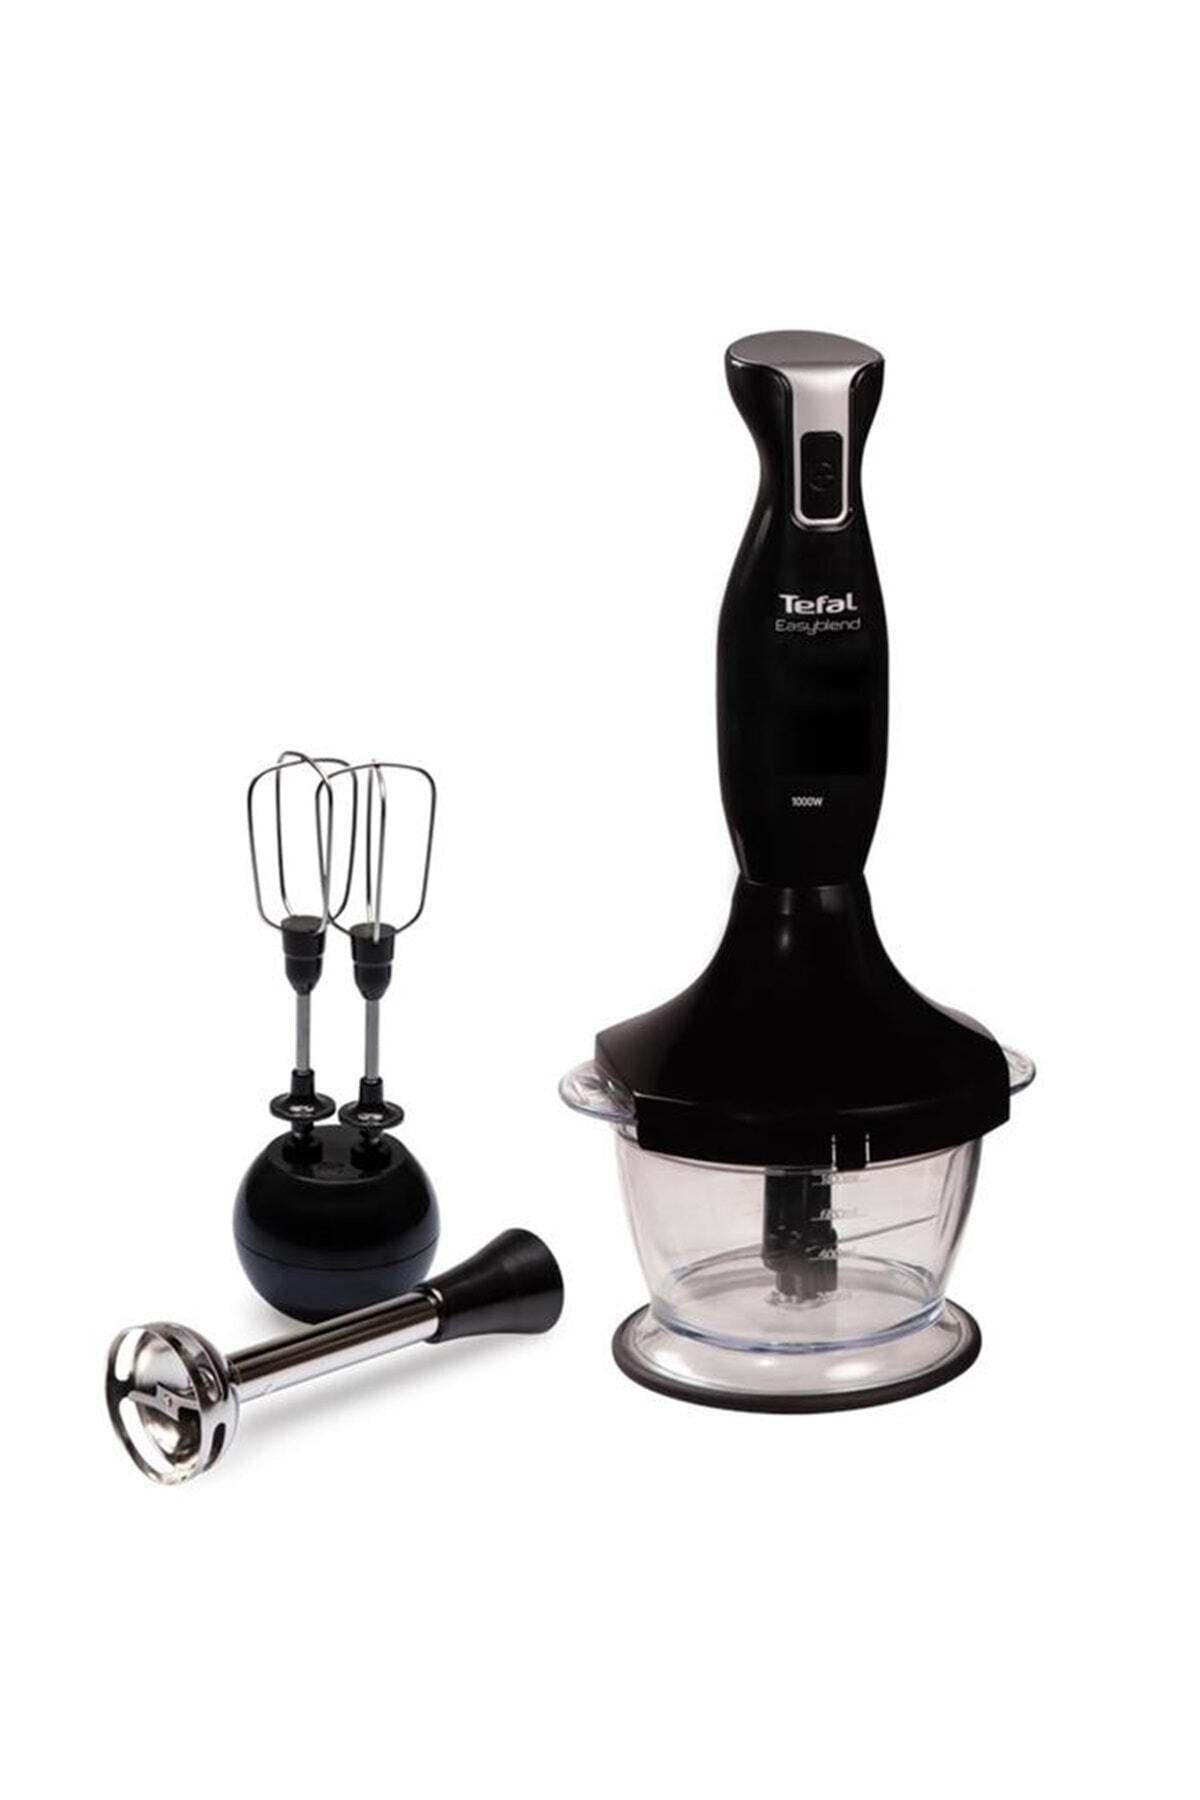 TEFAL Siyah Easyblend 1000w Mikser & Blender Seti Hb1838tr 1